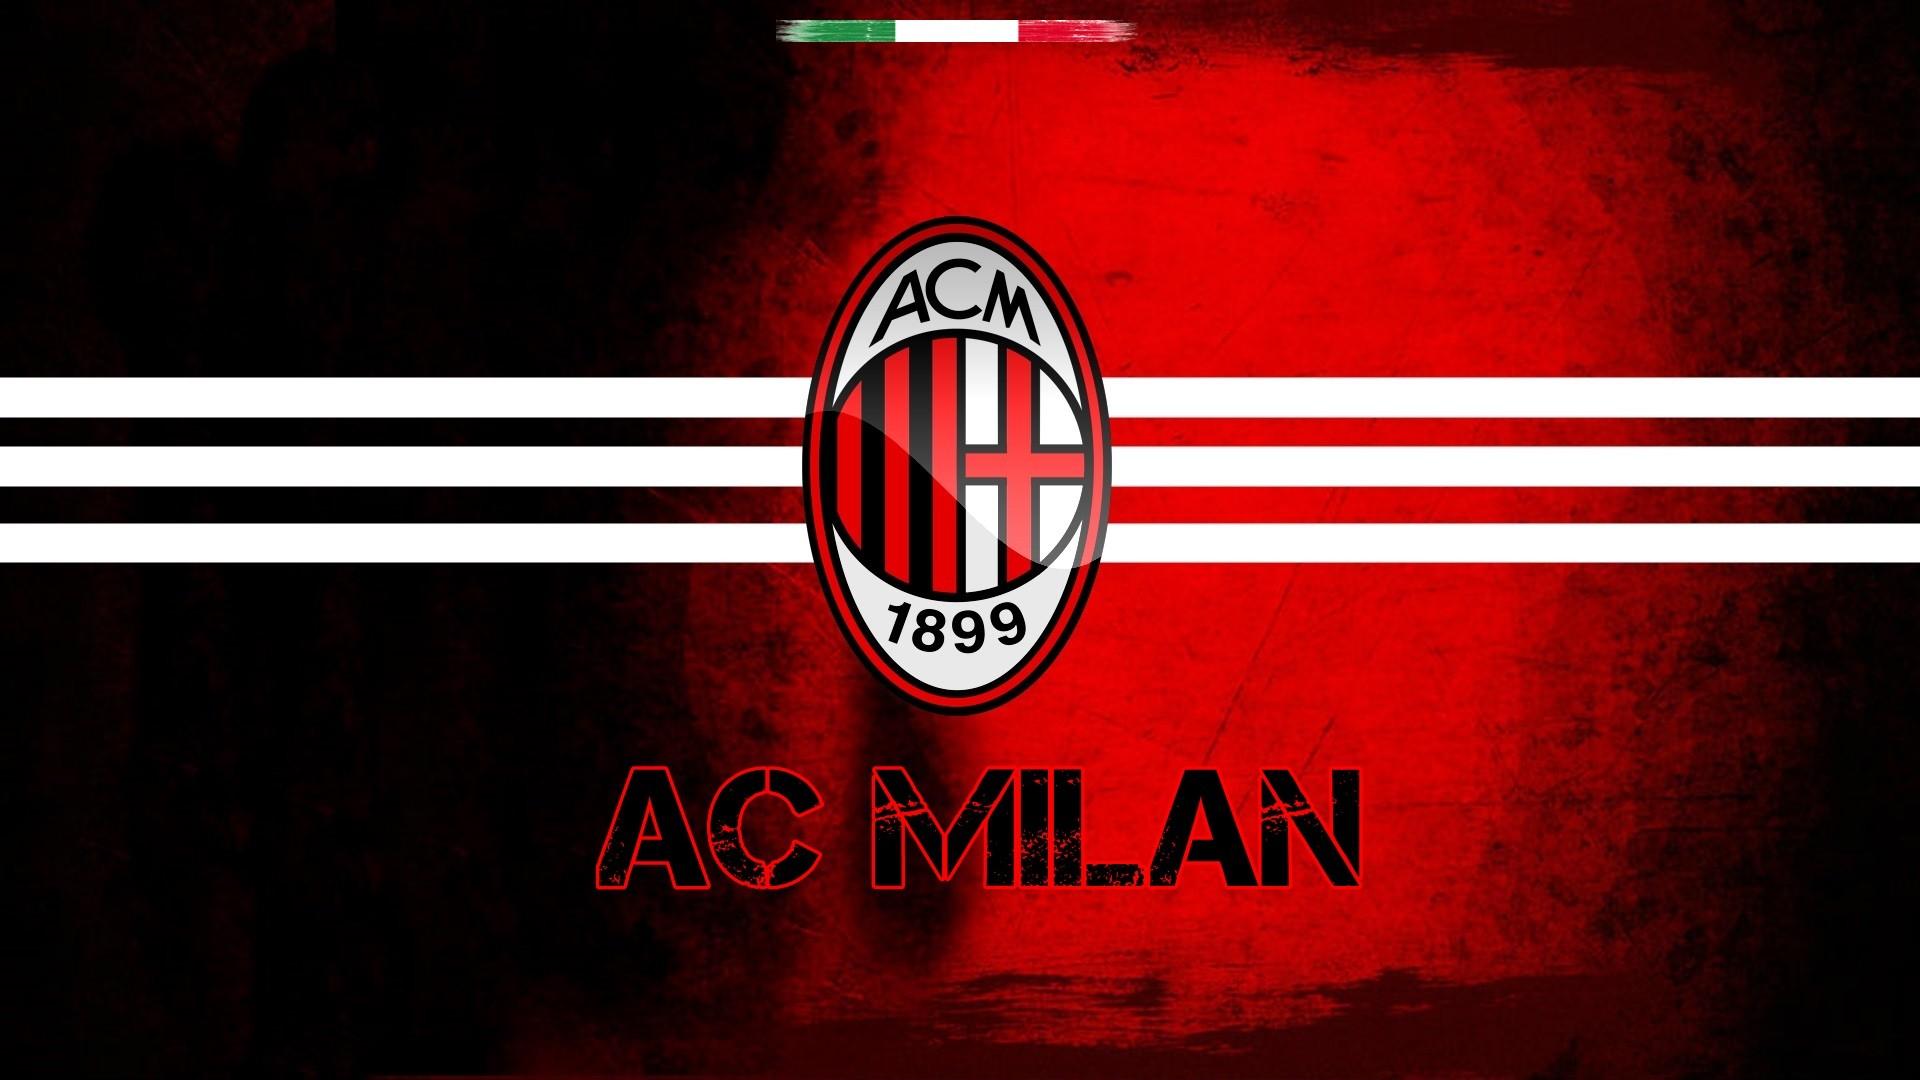 General 1920x1080 1899 (Year) AC Milan sport  soccer logo soccer clubs